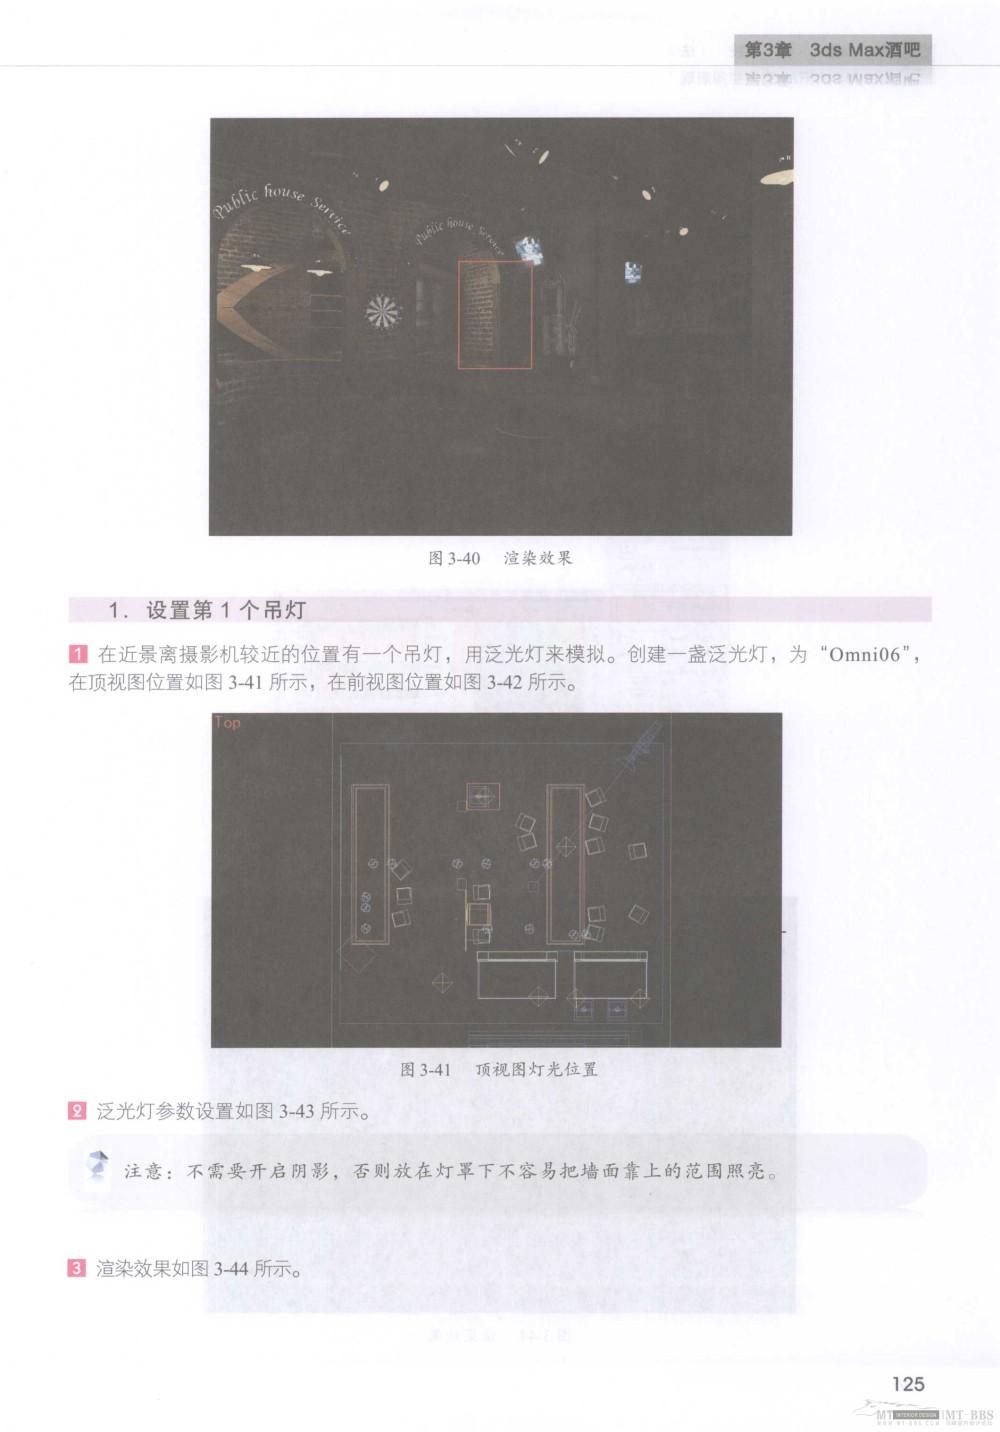 水晶石技法-3ds_Max&VRay室内空间表现_水晶石技法-3ds_Max&VRay室内空间表现_页面_131.jpg